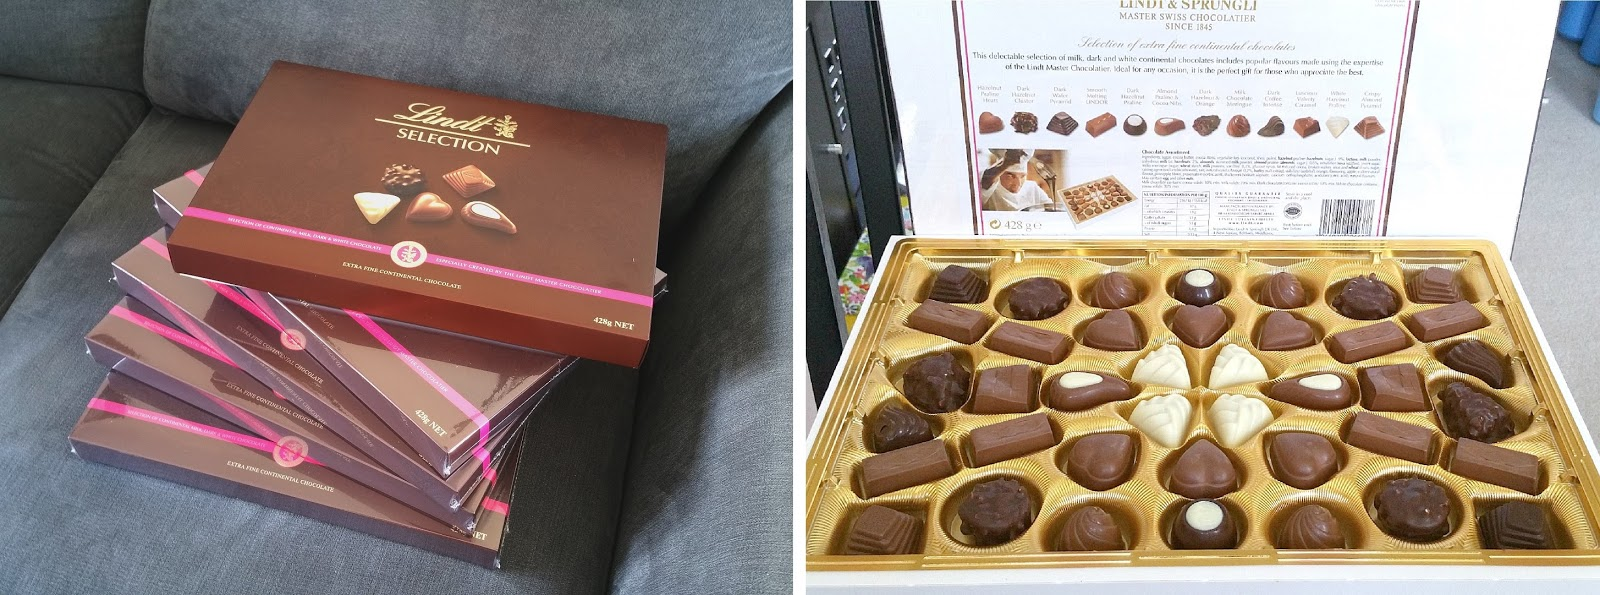 Fathers Day chocolates, Lindt Chocolates Assorted, Chocolate Decorated Lemon Cake